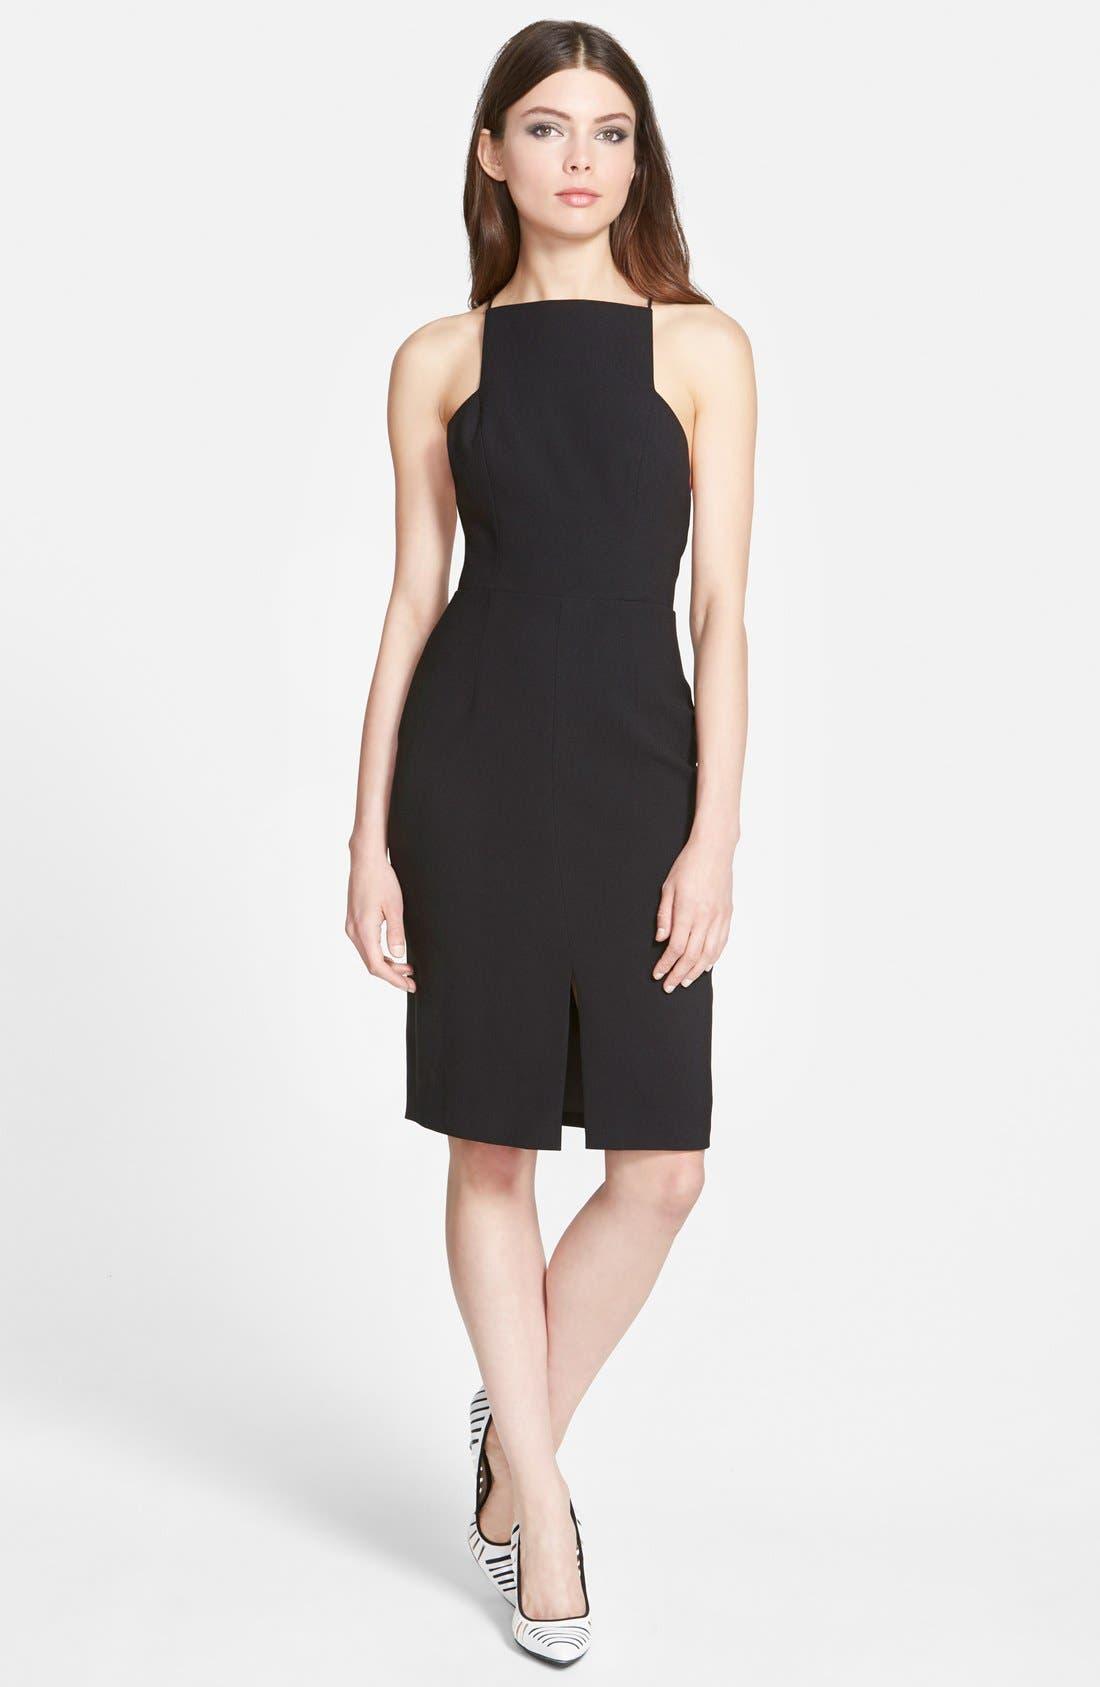 Main Image - Keepsake the Label 'Restless Heart' Sleeveless Dress